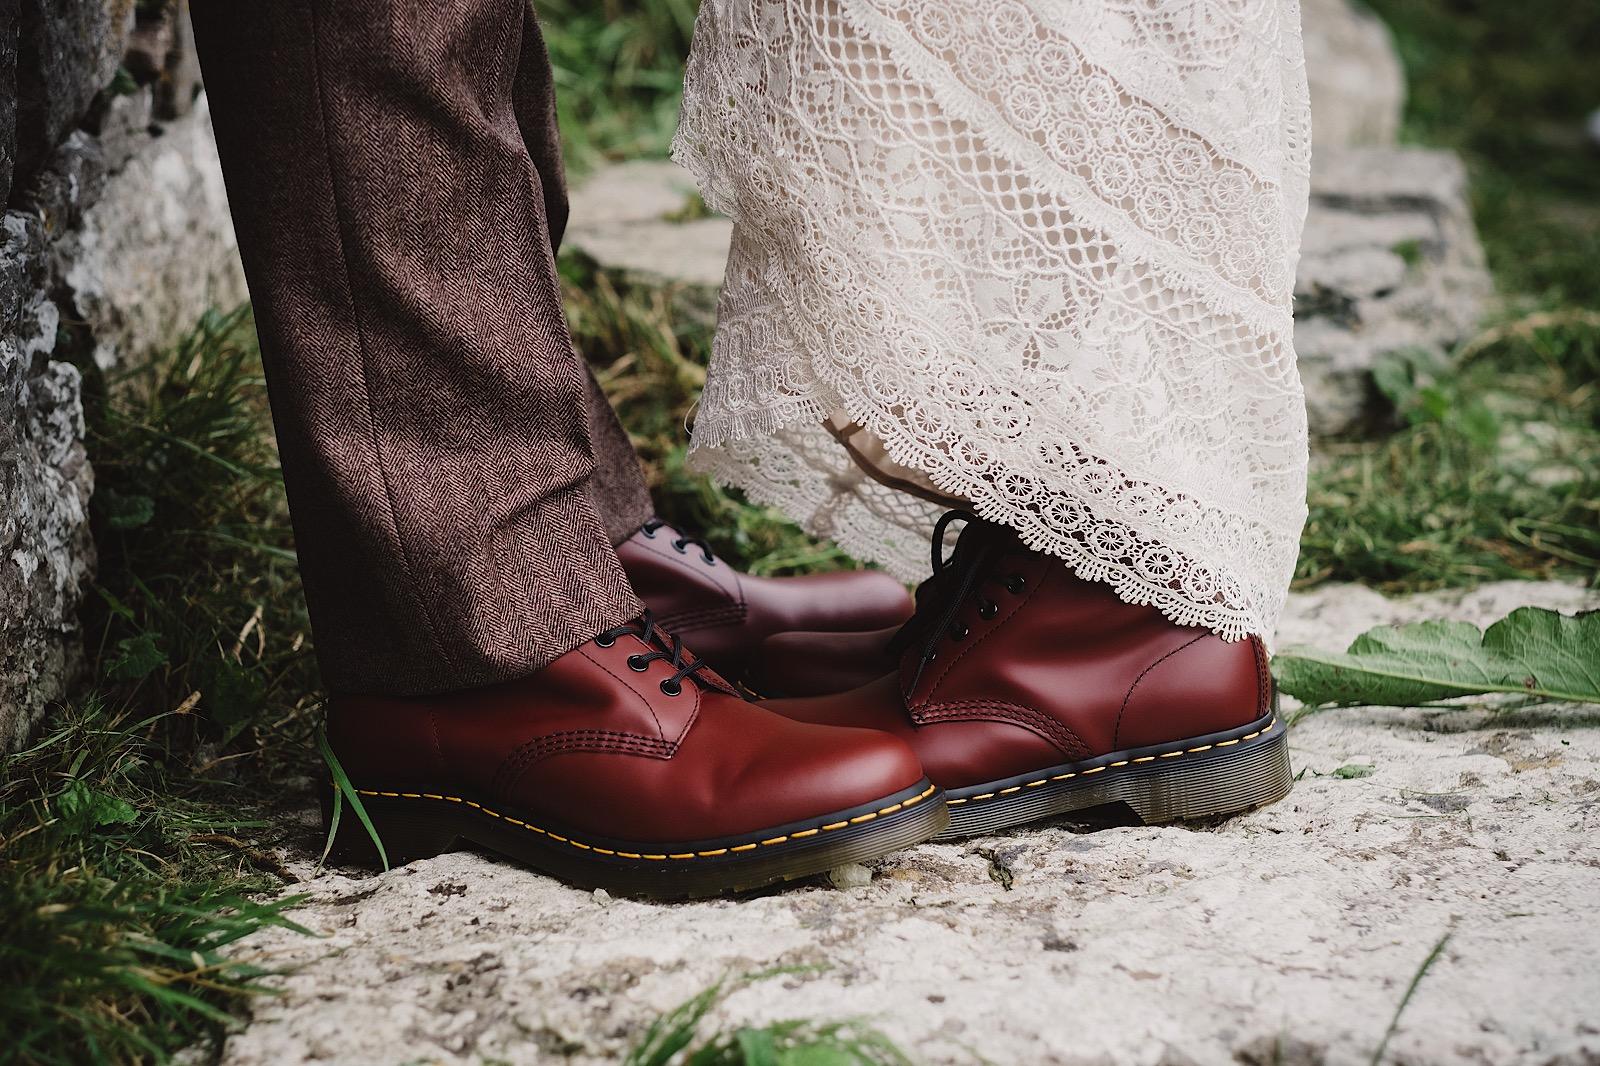 Elopement_Wedding_Ireland_Cliffs_of_moher0020